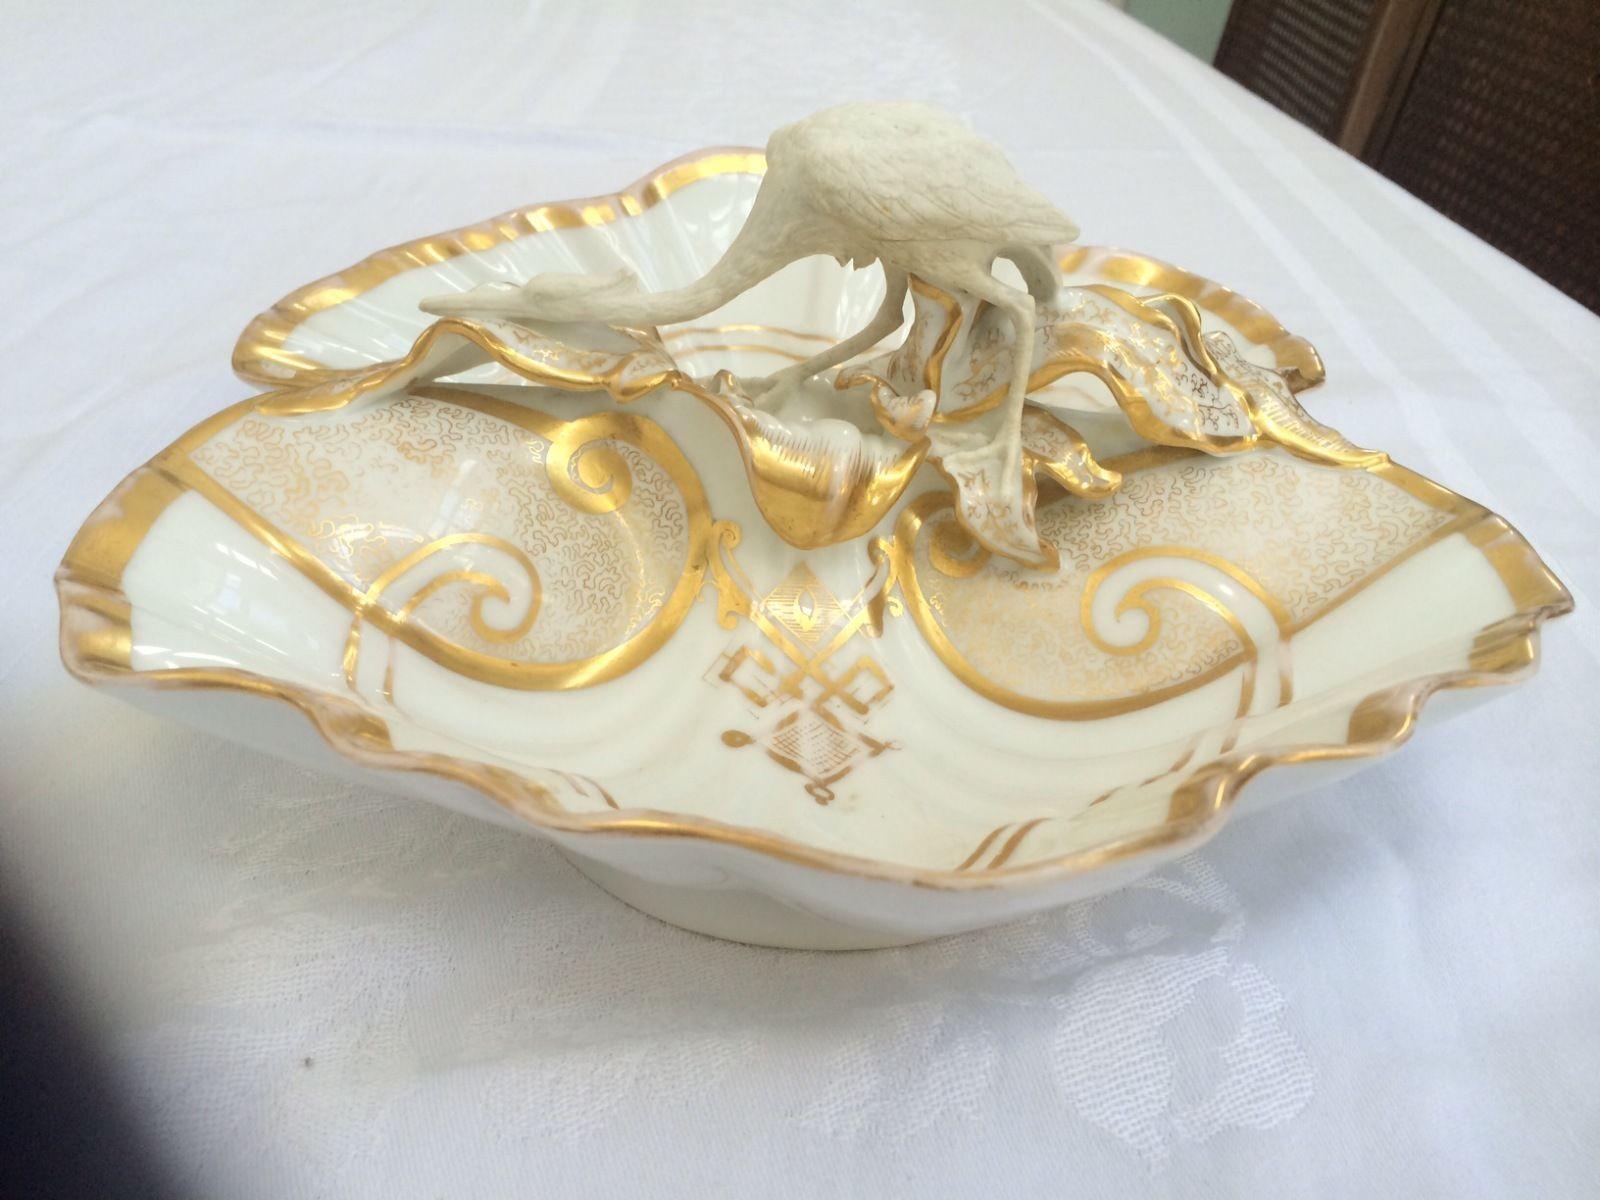 Antique Carl Tielsch Altwasser Germany Divided Serving Dish w Heron   eBay  $425